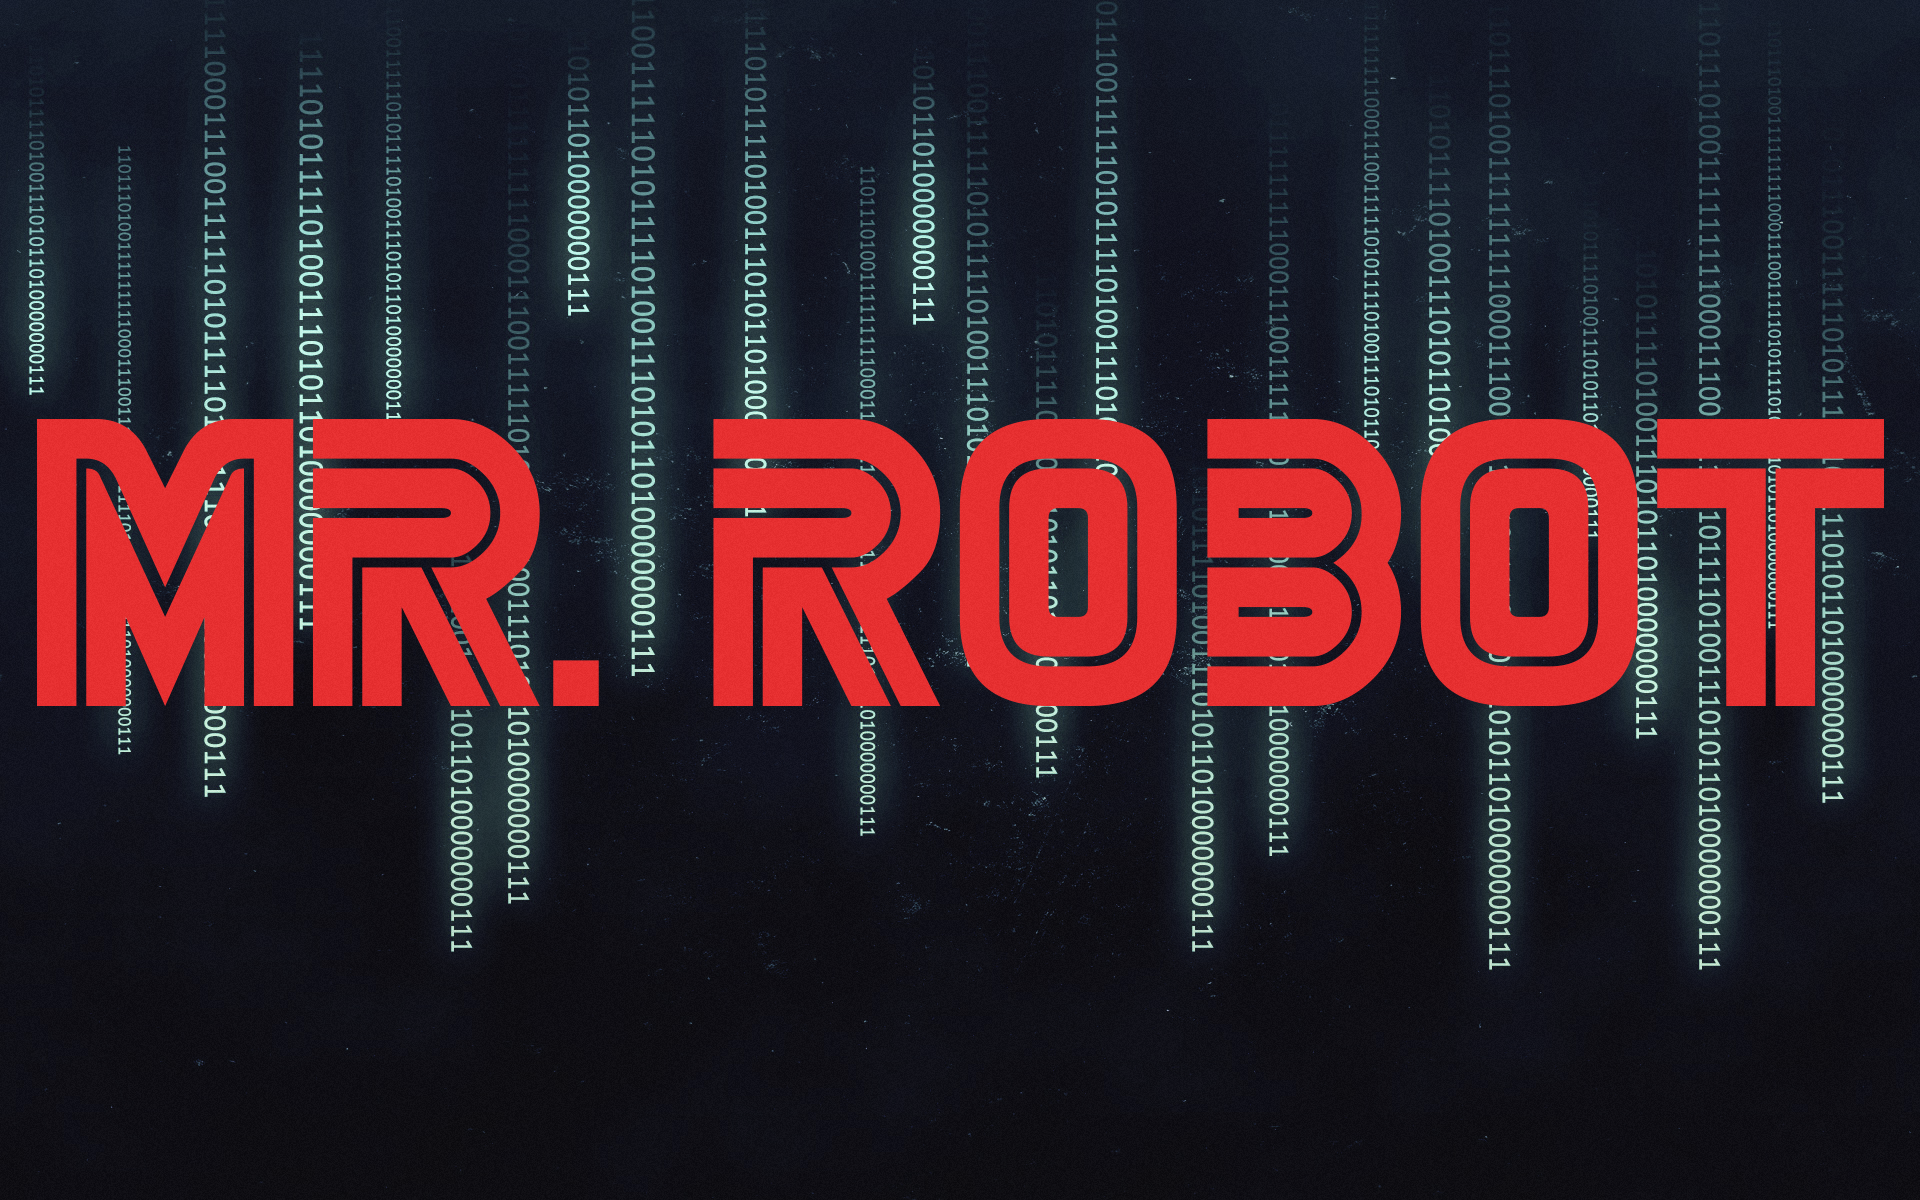 Mr.-Robot-logo.png